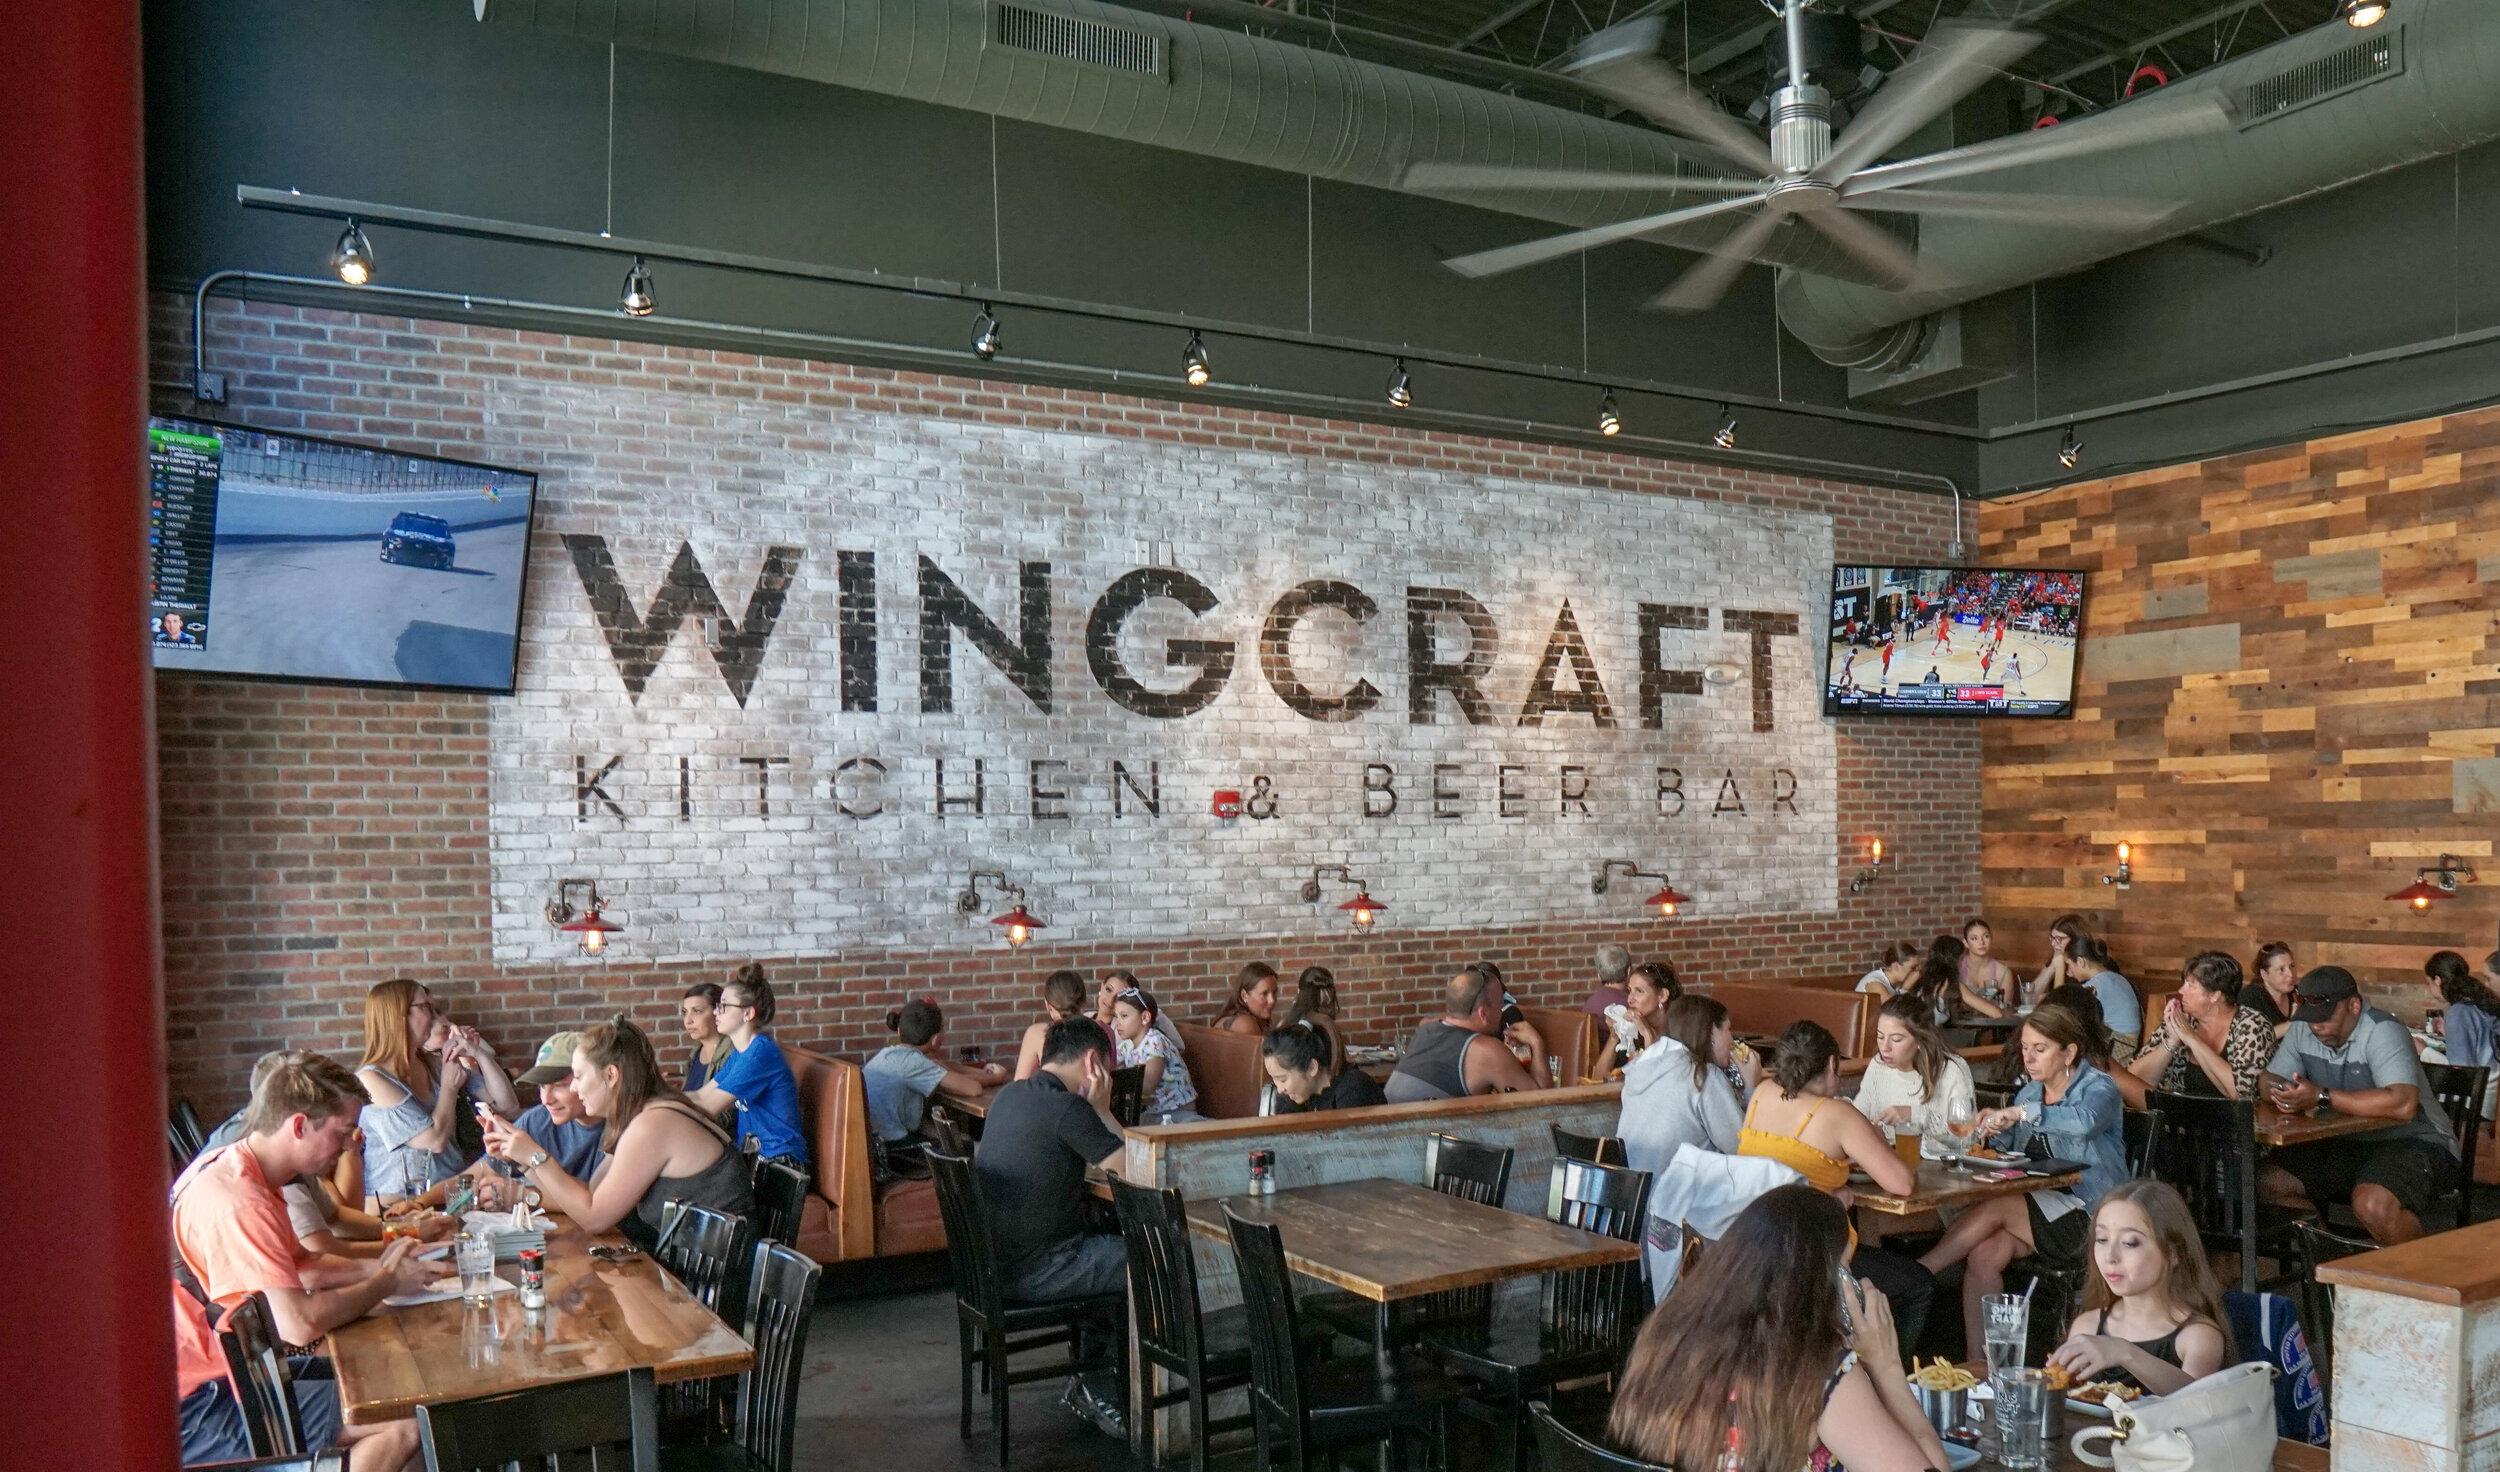 Wingcraft